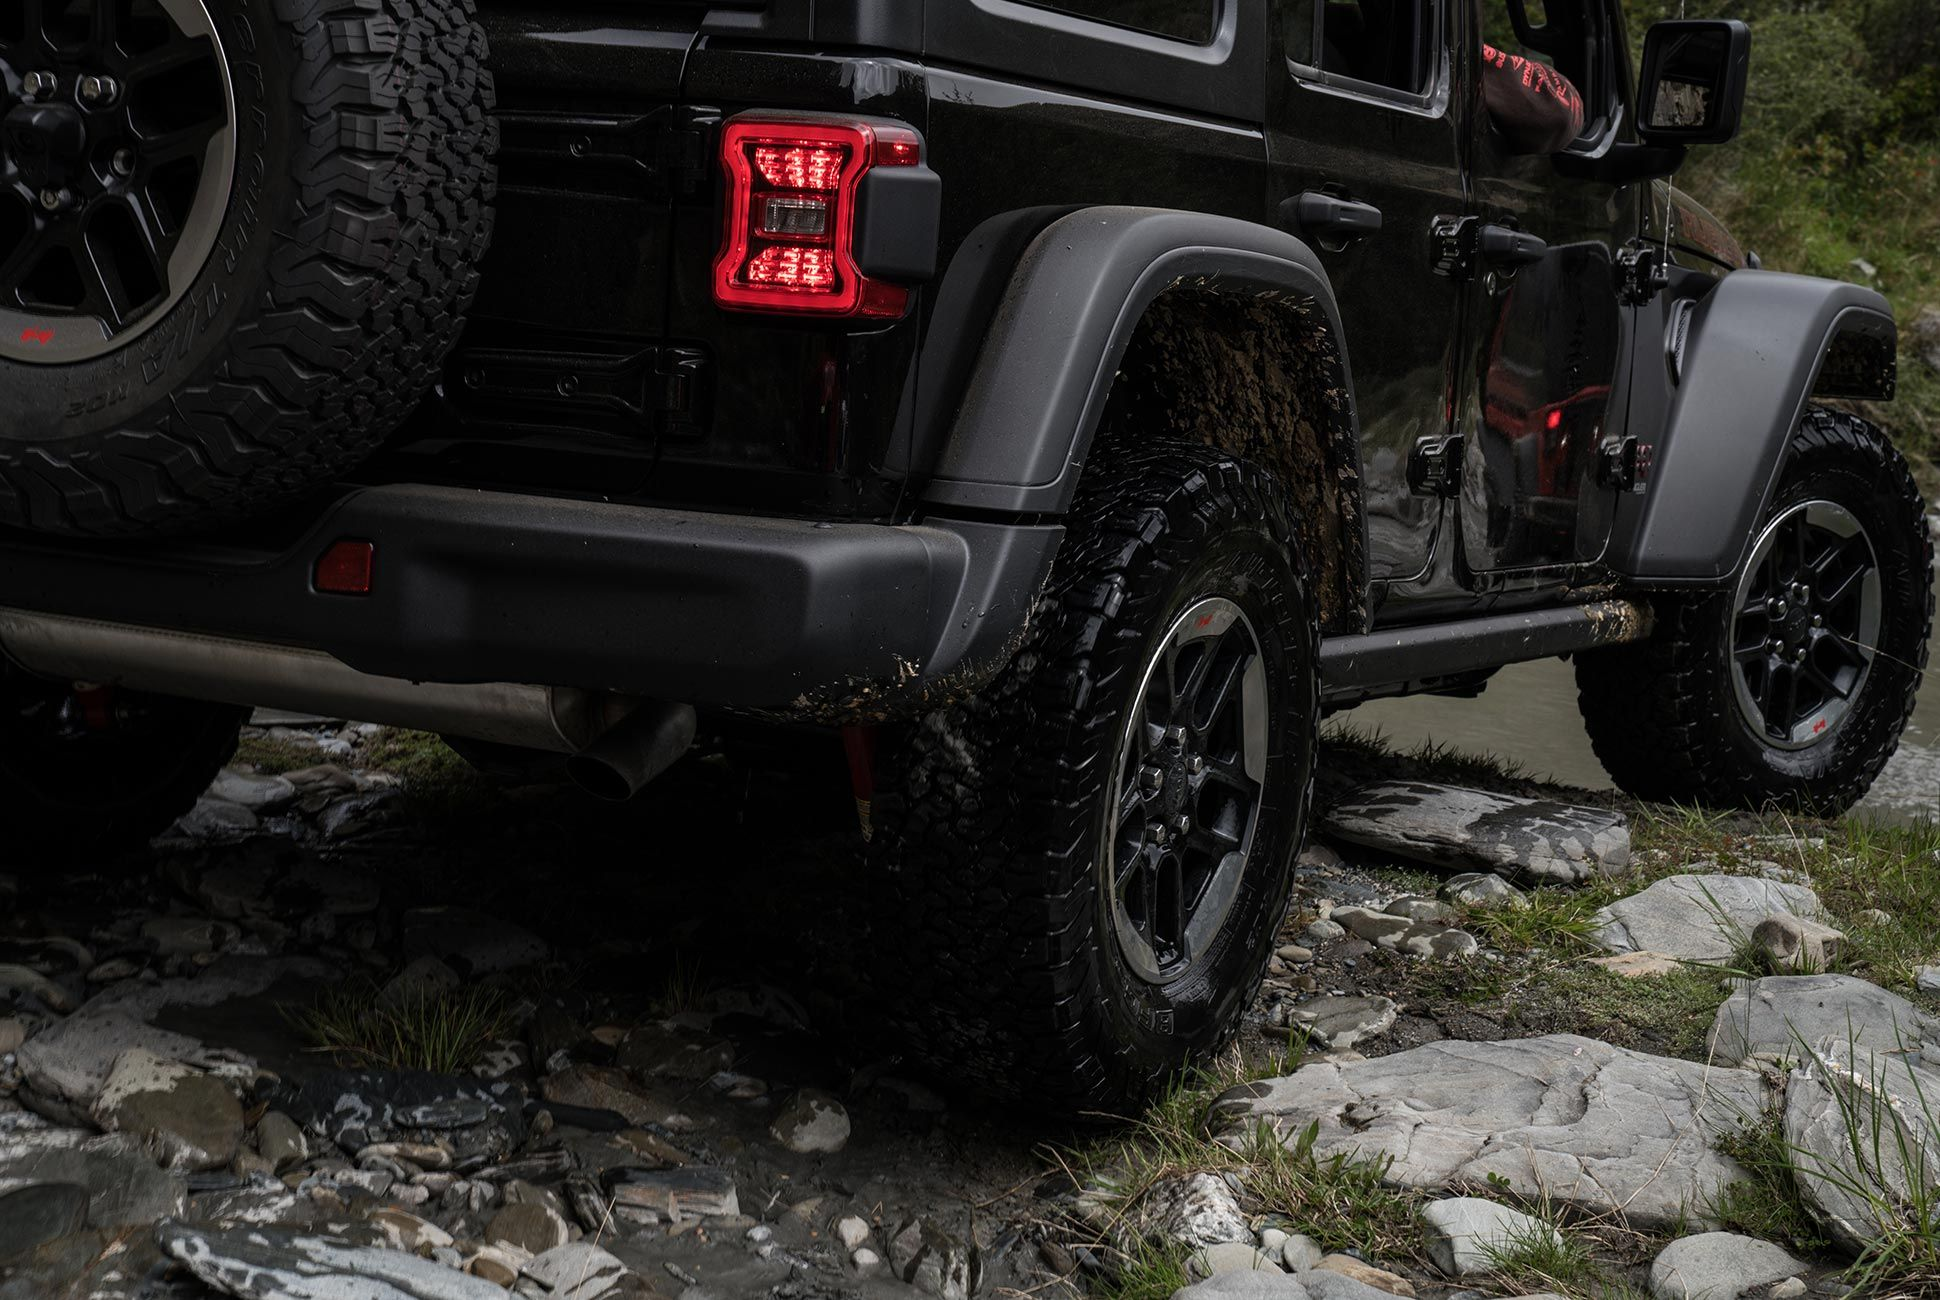 2018-Jeep-Wrangler-Review-gear-patrol-4